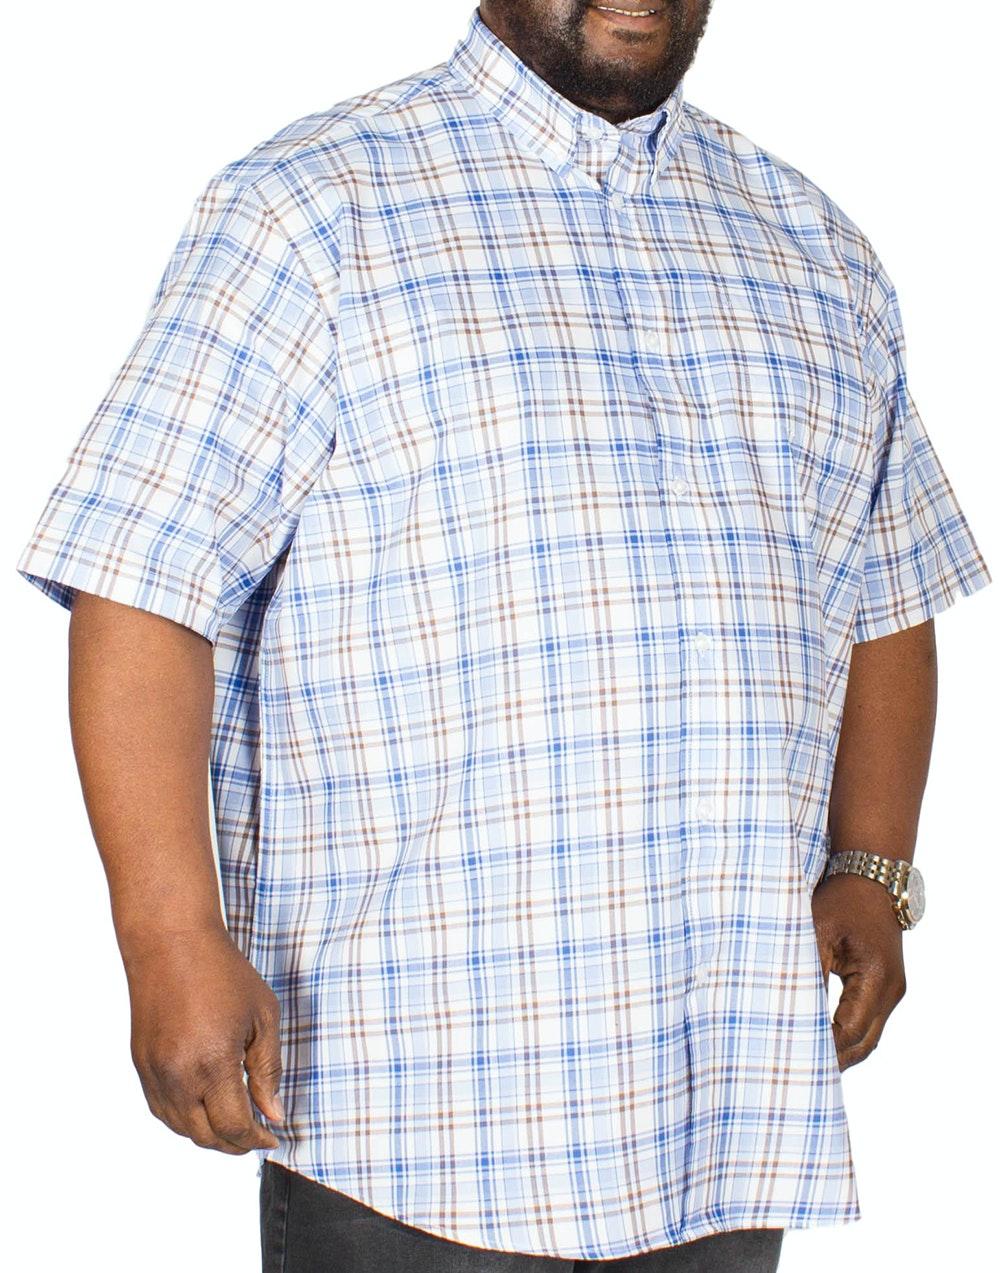 Carabou Check Shirt Blue/Brown